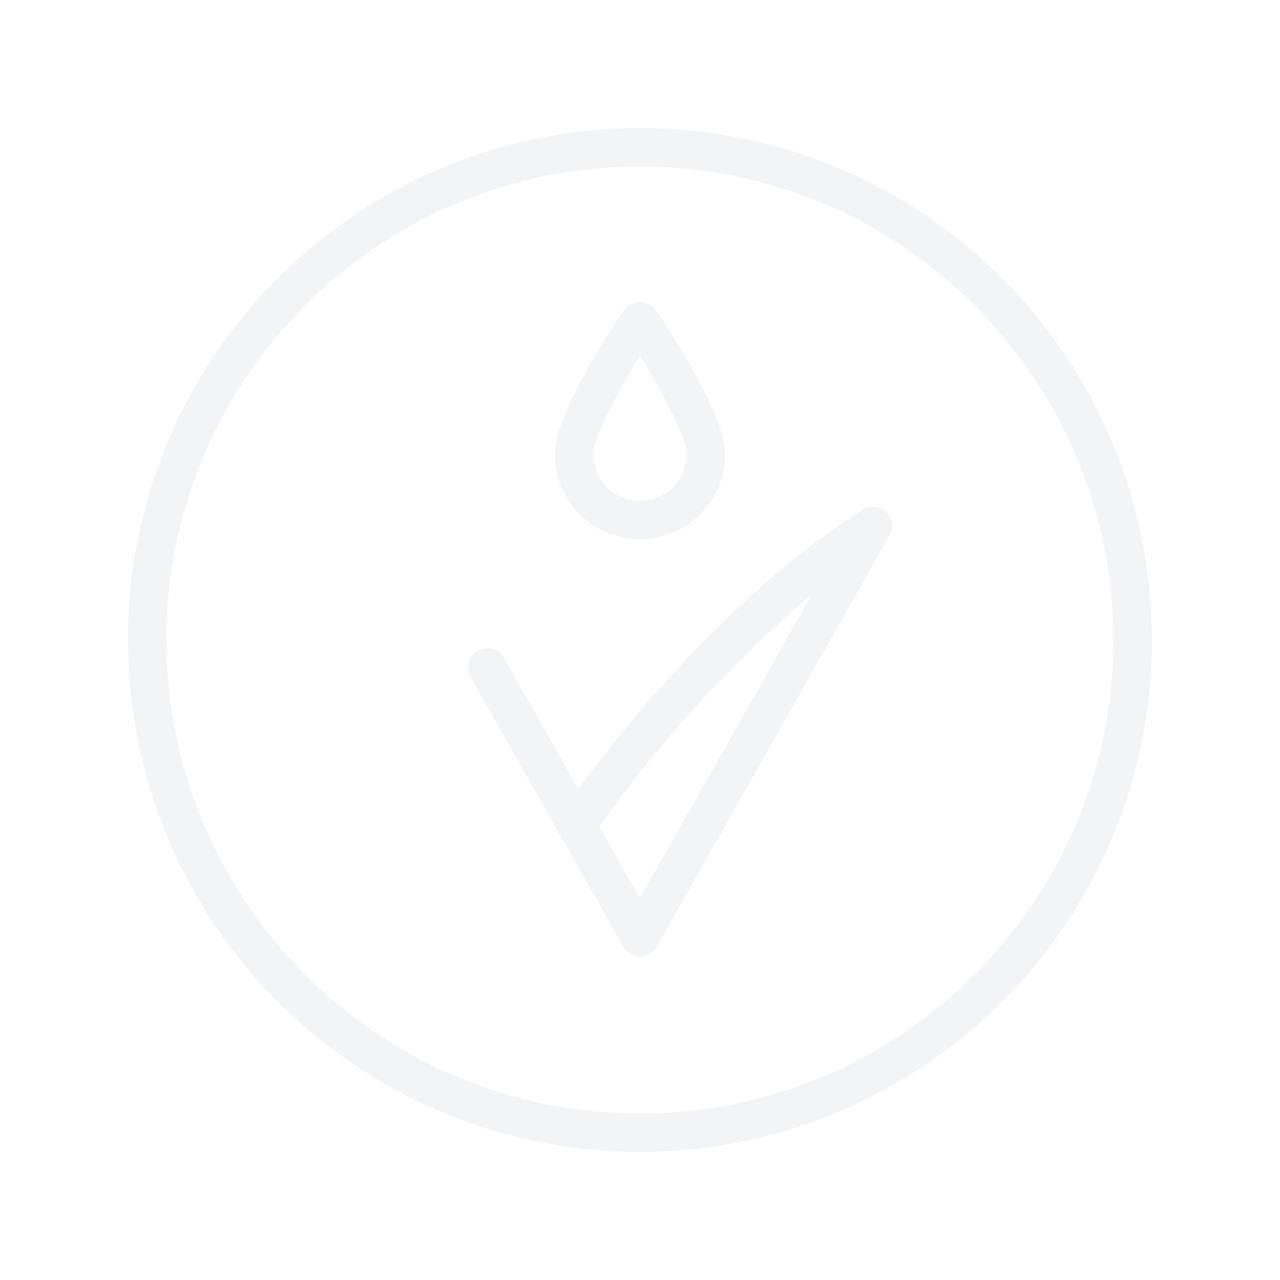 BIOTHERM Biosource Softening & Makeup Removing Milk